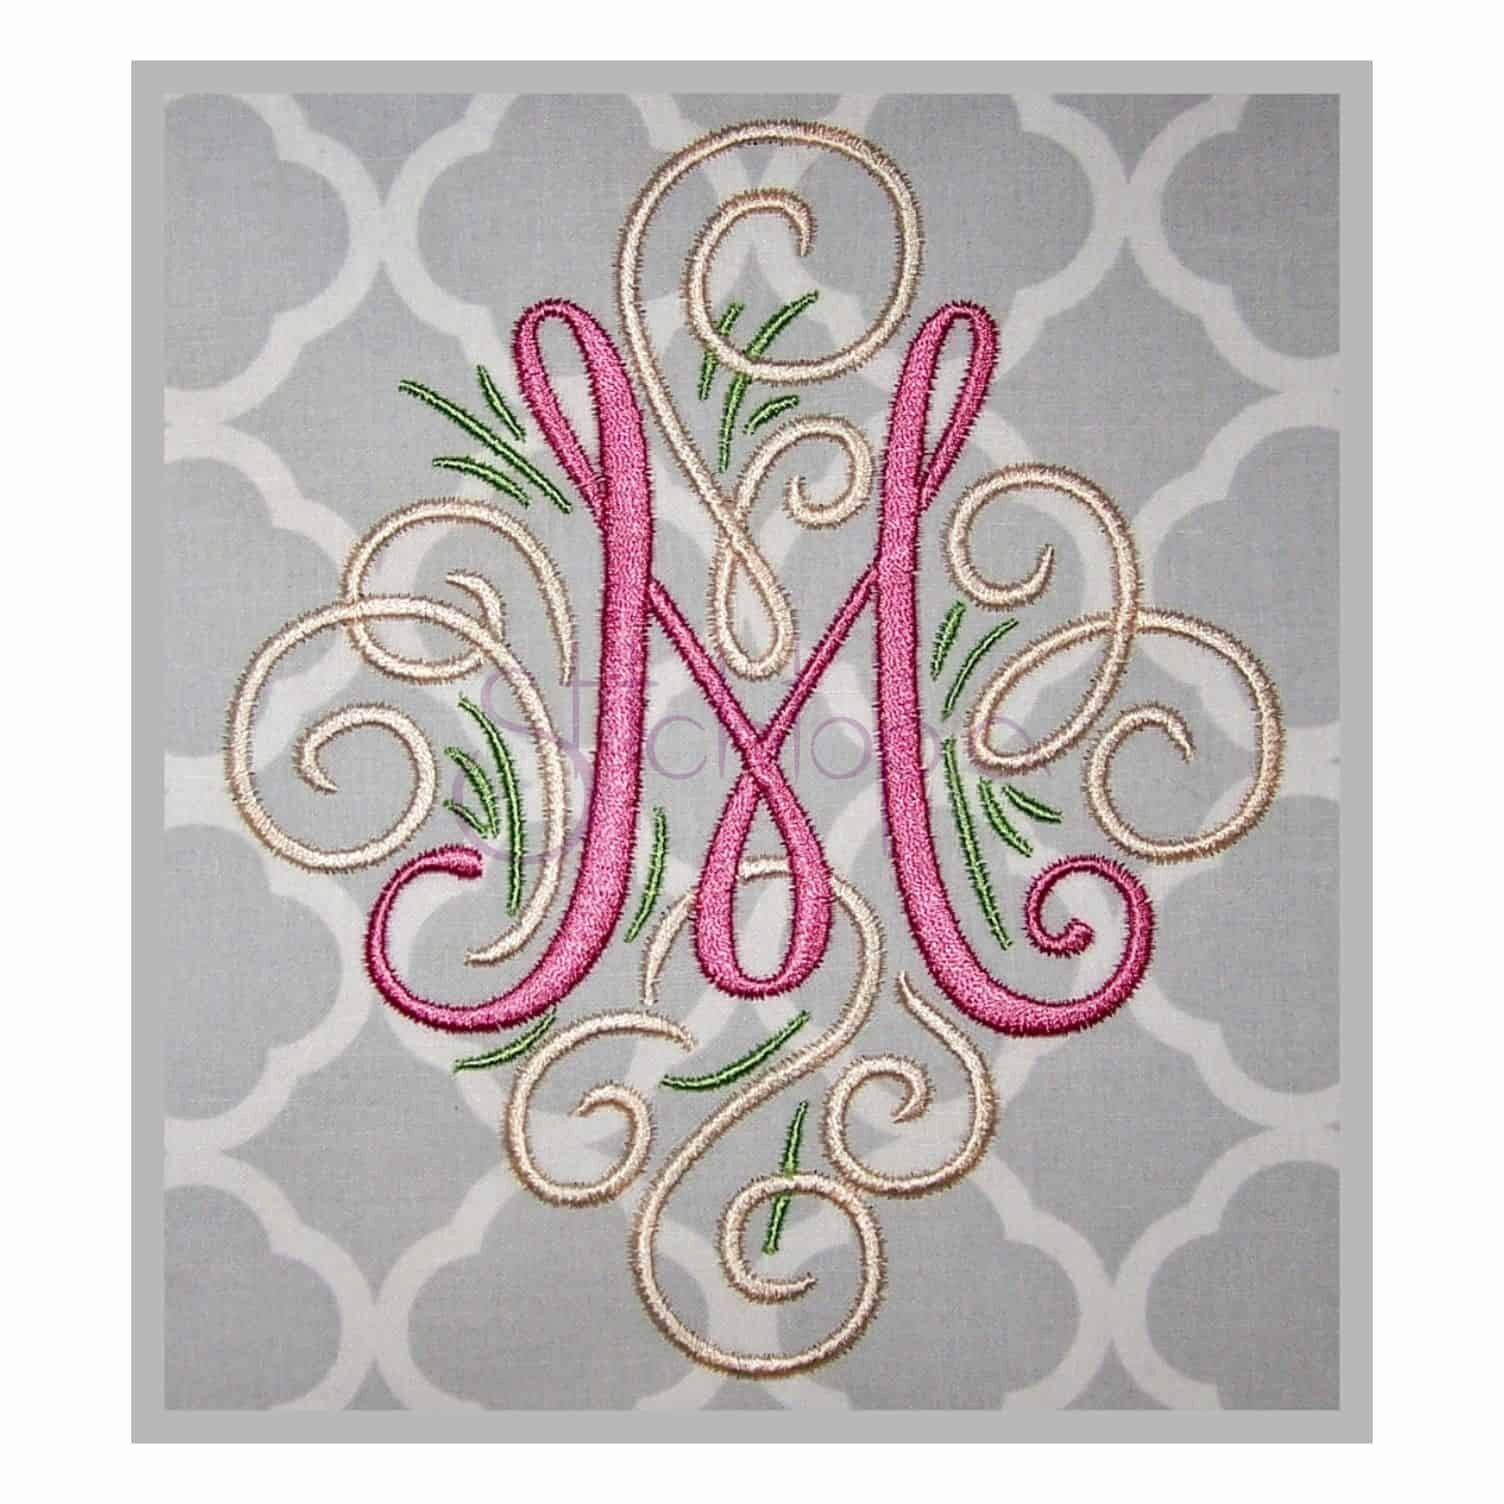 Free Embroidery Monogram Fonts Beautiful Machine Embroidery Font Adorn Monogram